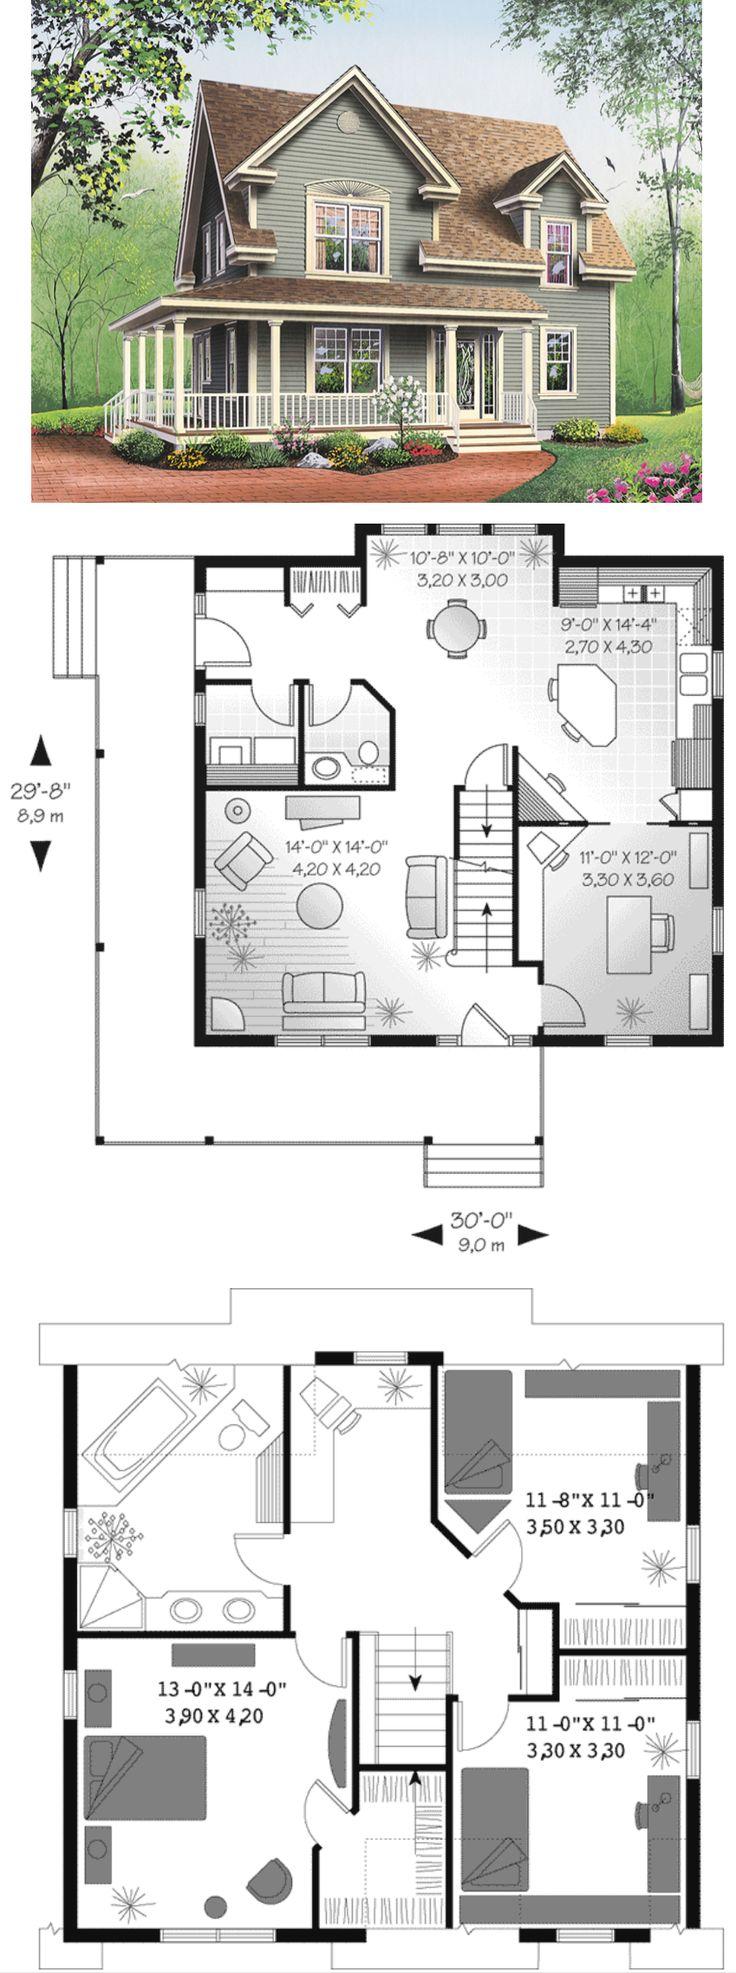 1000+ ideas about Small Farmhouse Plans on Pinterest Farmhouse ... - ^